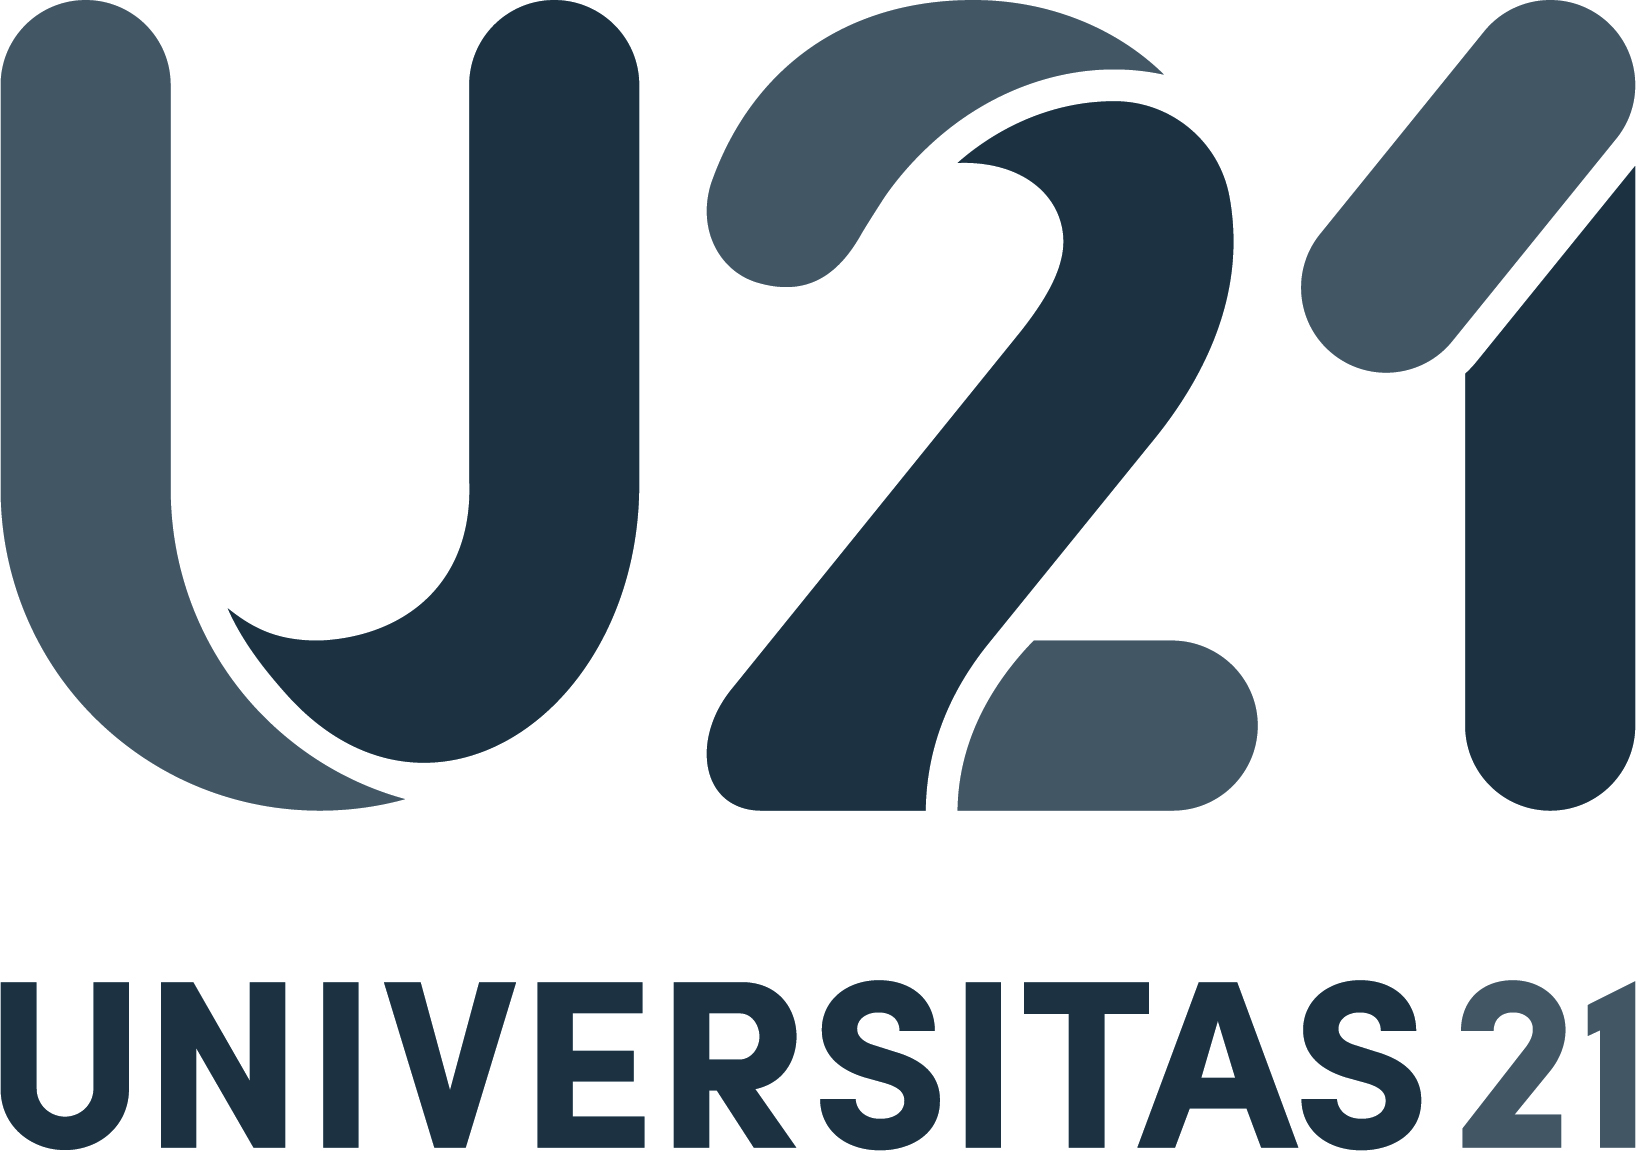 logo for Universitas 21